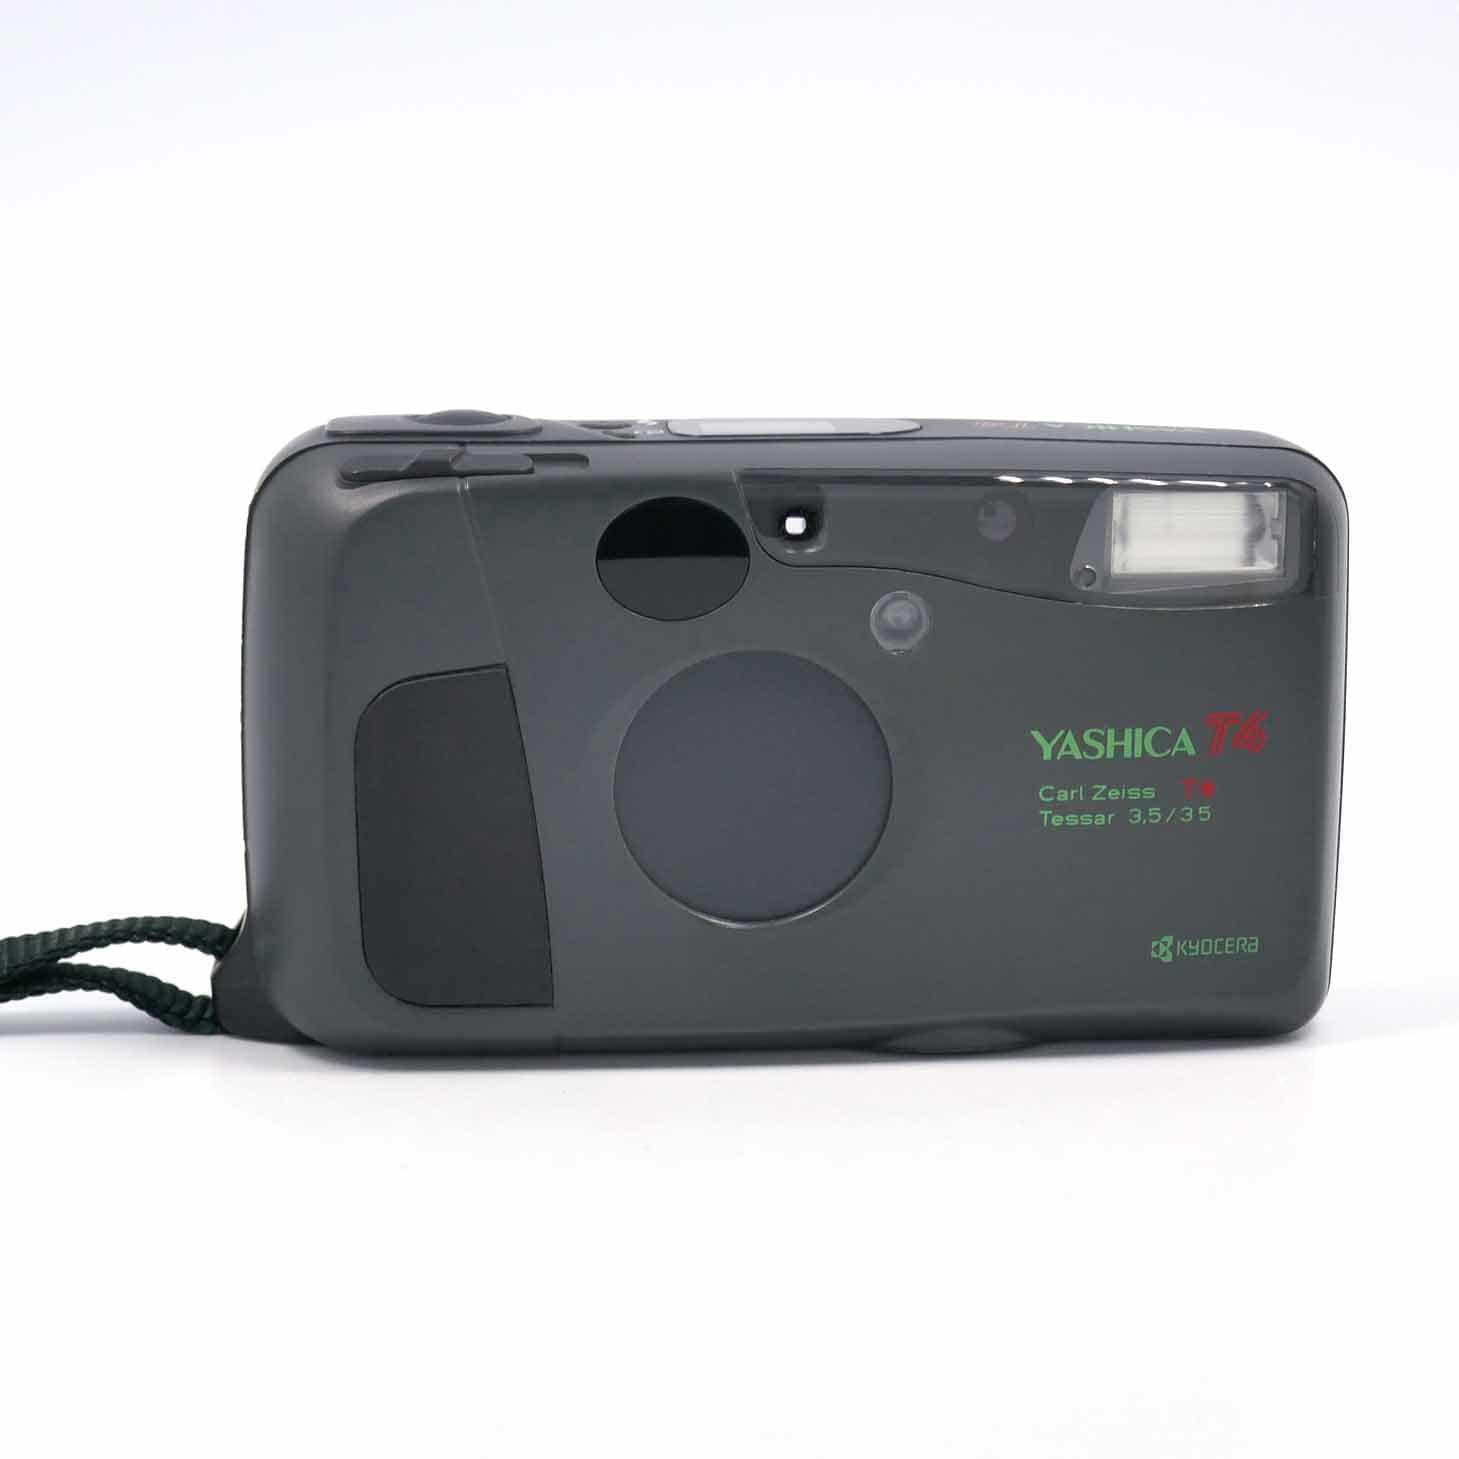 clean-cameras-Yashica-T4-Safari-07